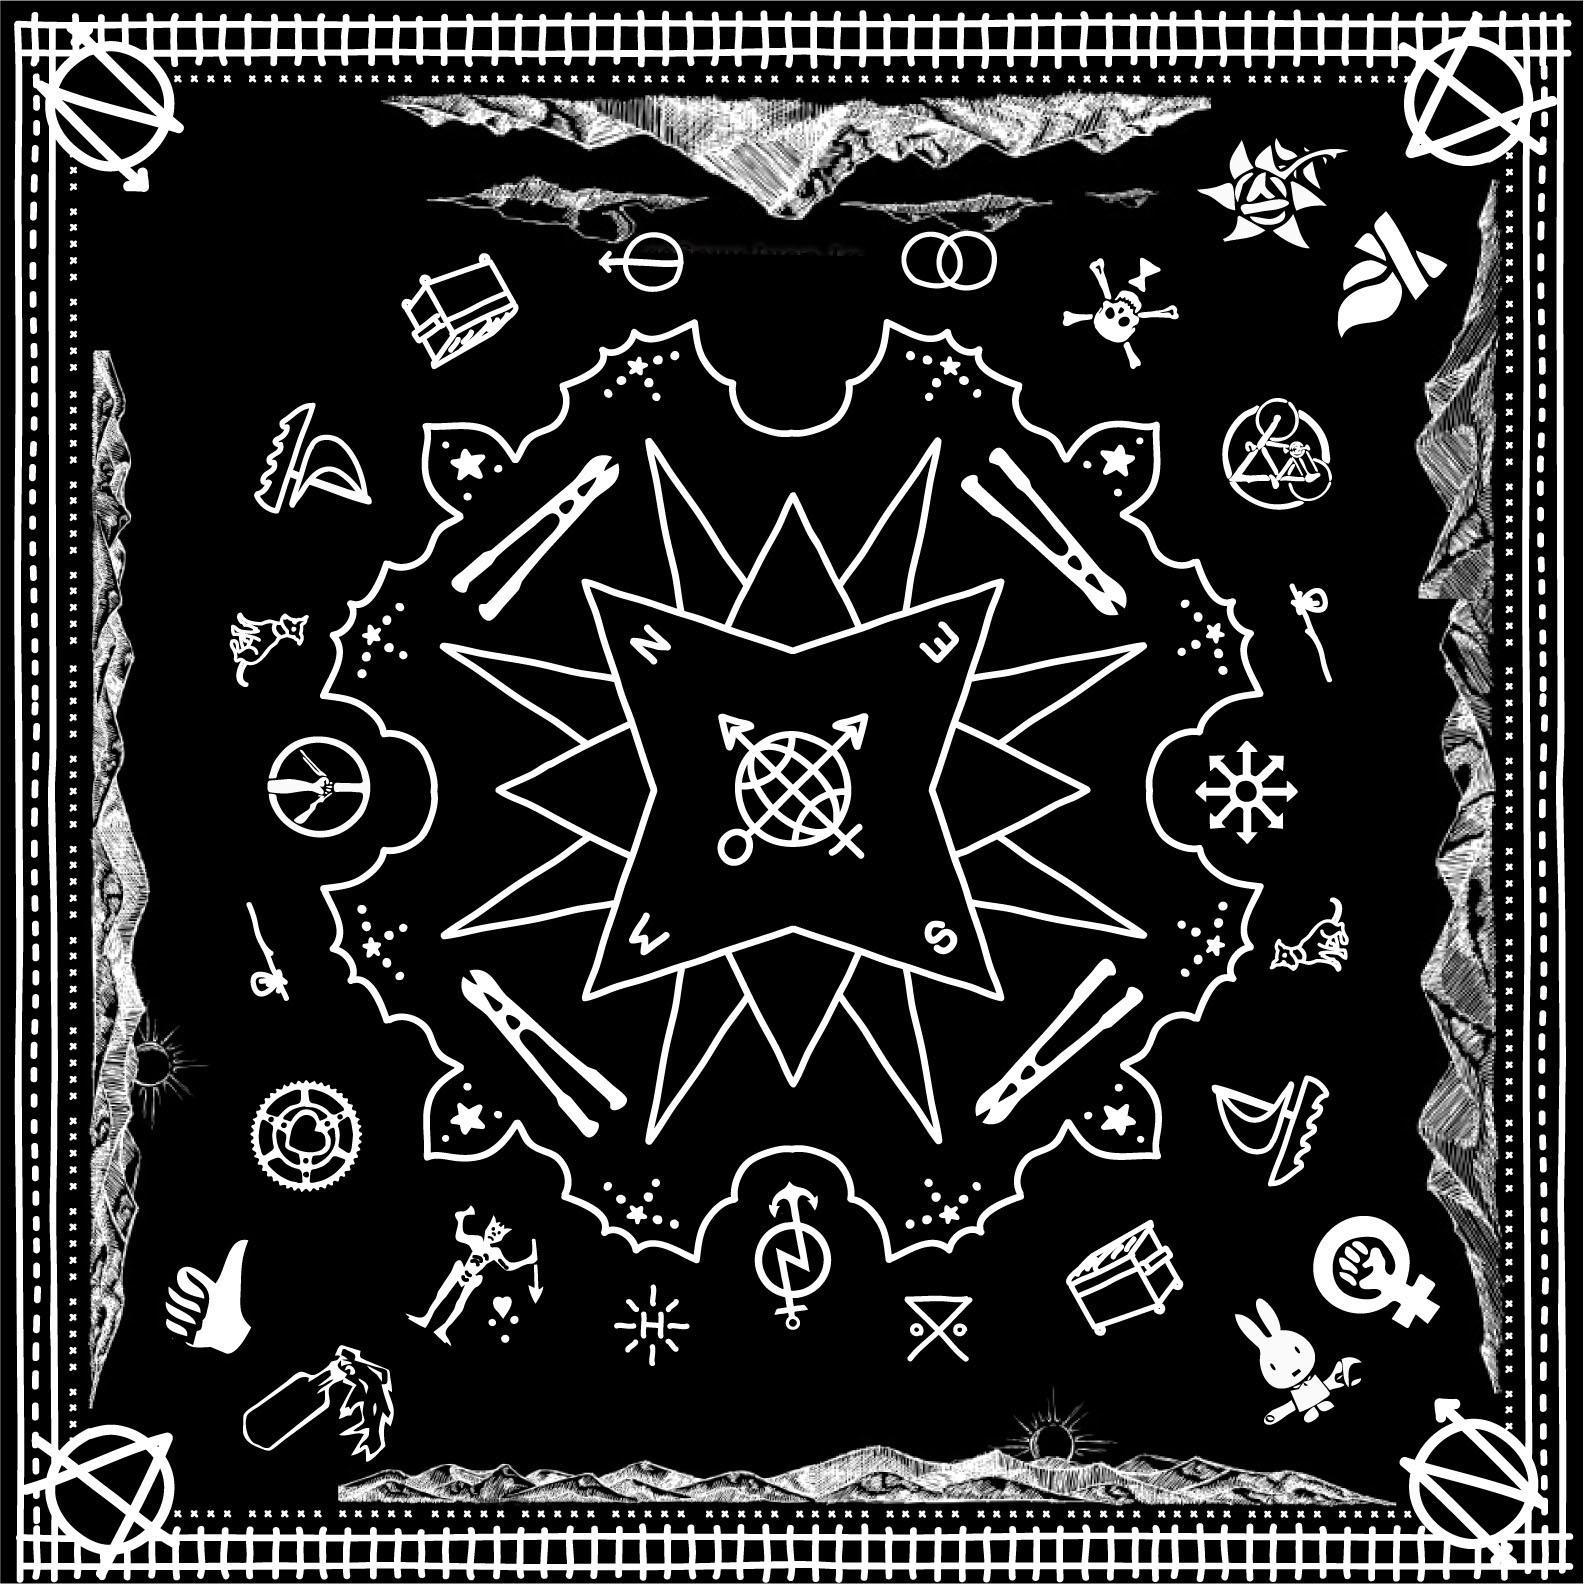 bandkerchief_stpv2_blk-jpg.17755